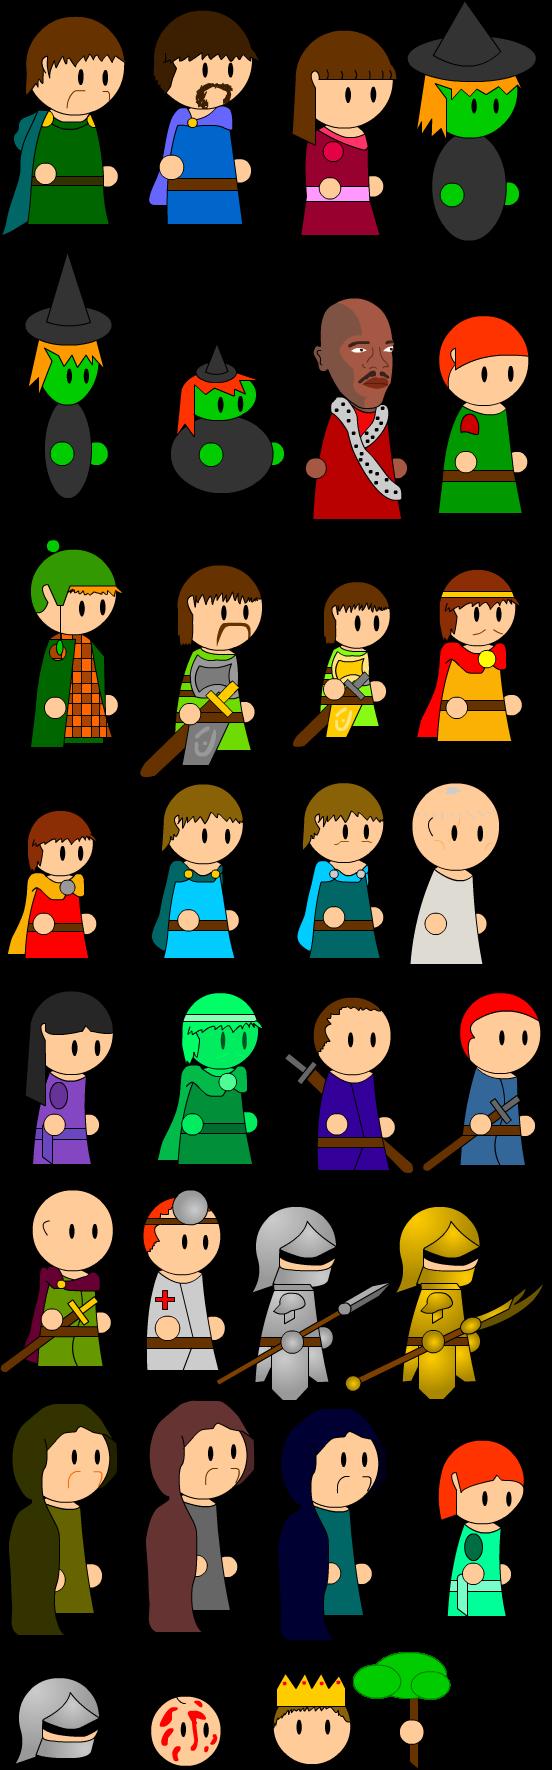 King clipart macbeth. Character models by mitsimaru